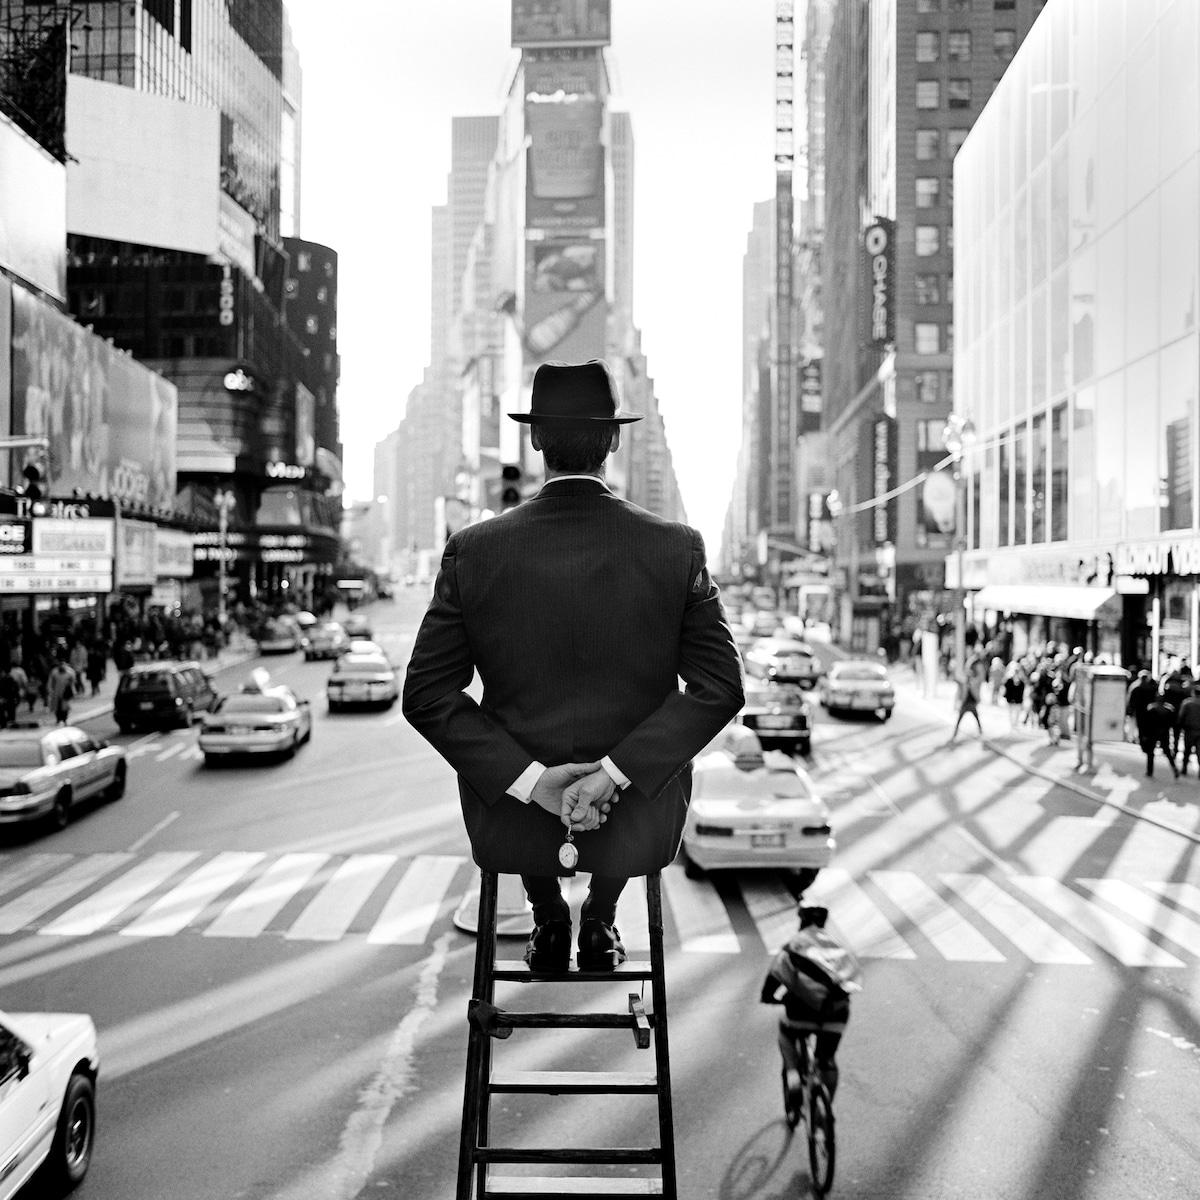 Rodney-Smith-Fine-Art-Photography-9.jpg